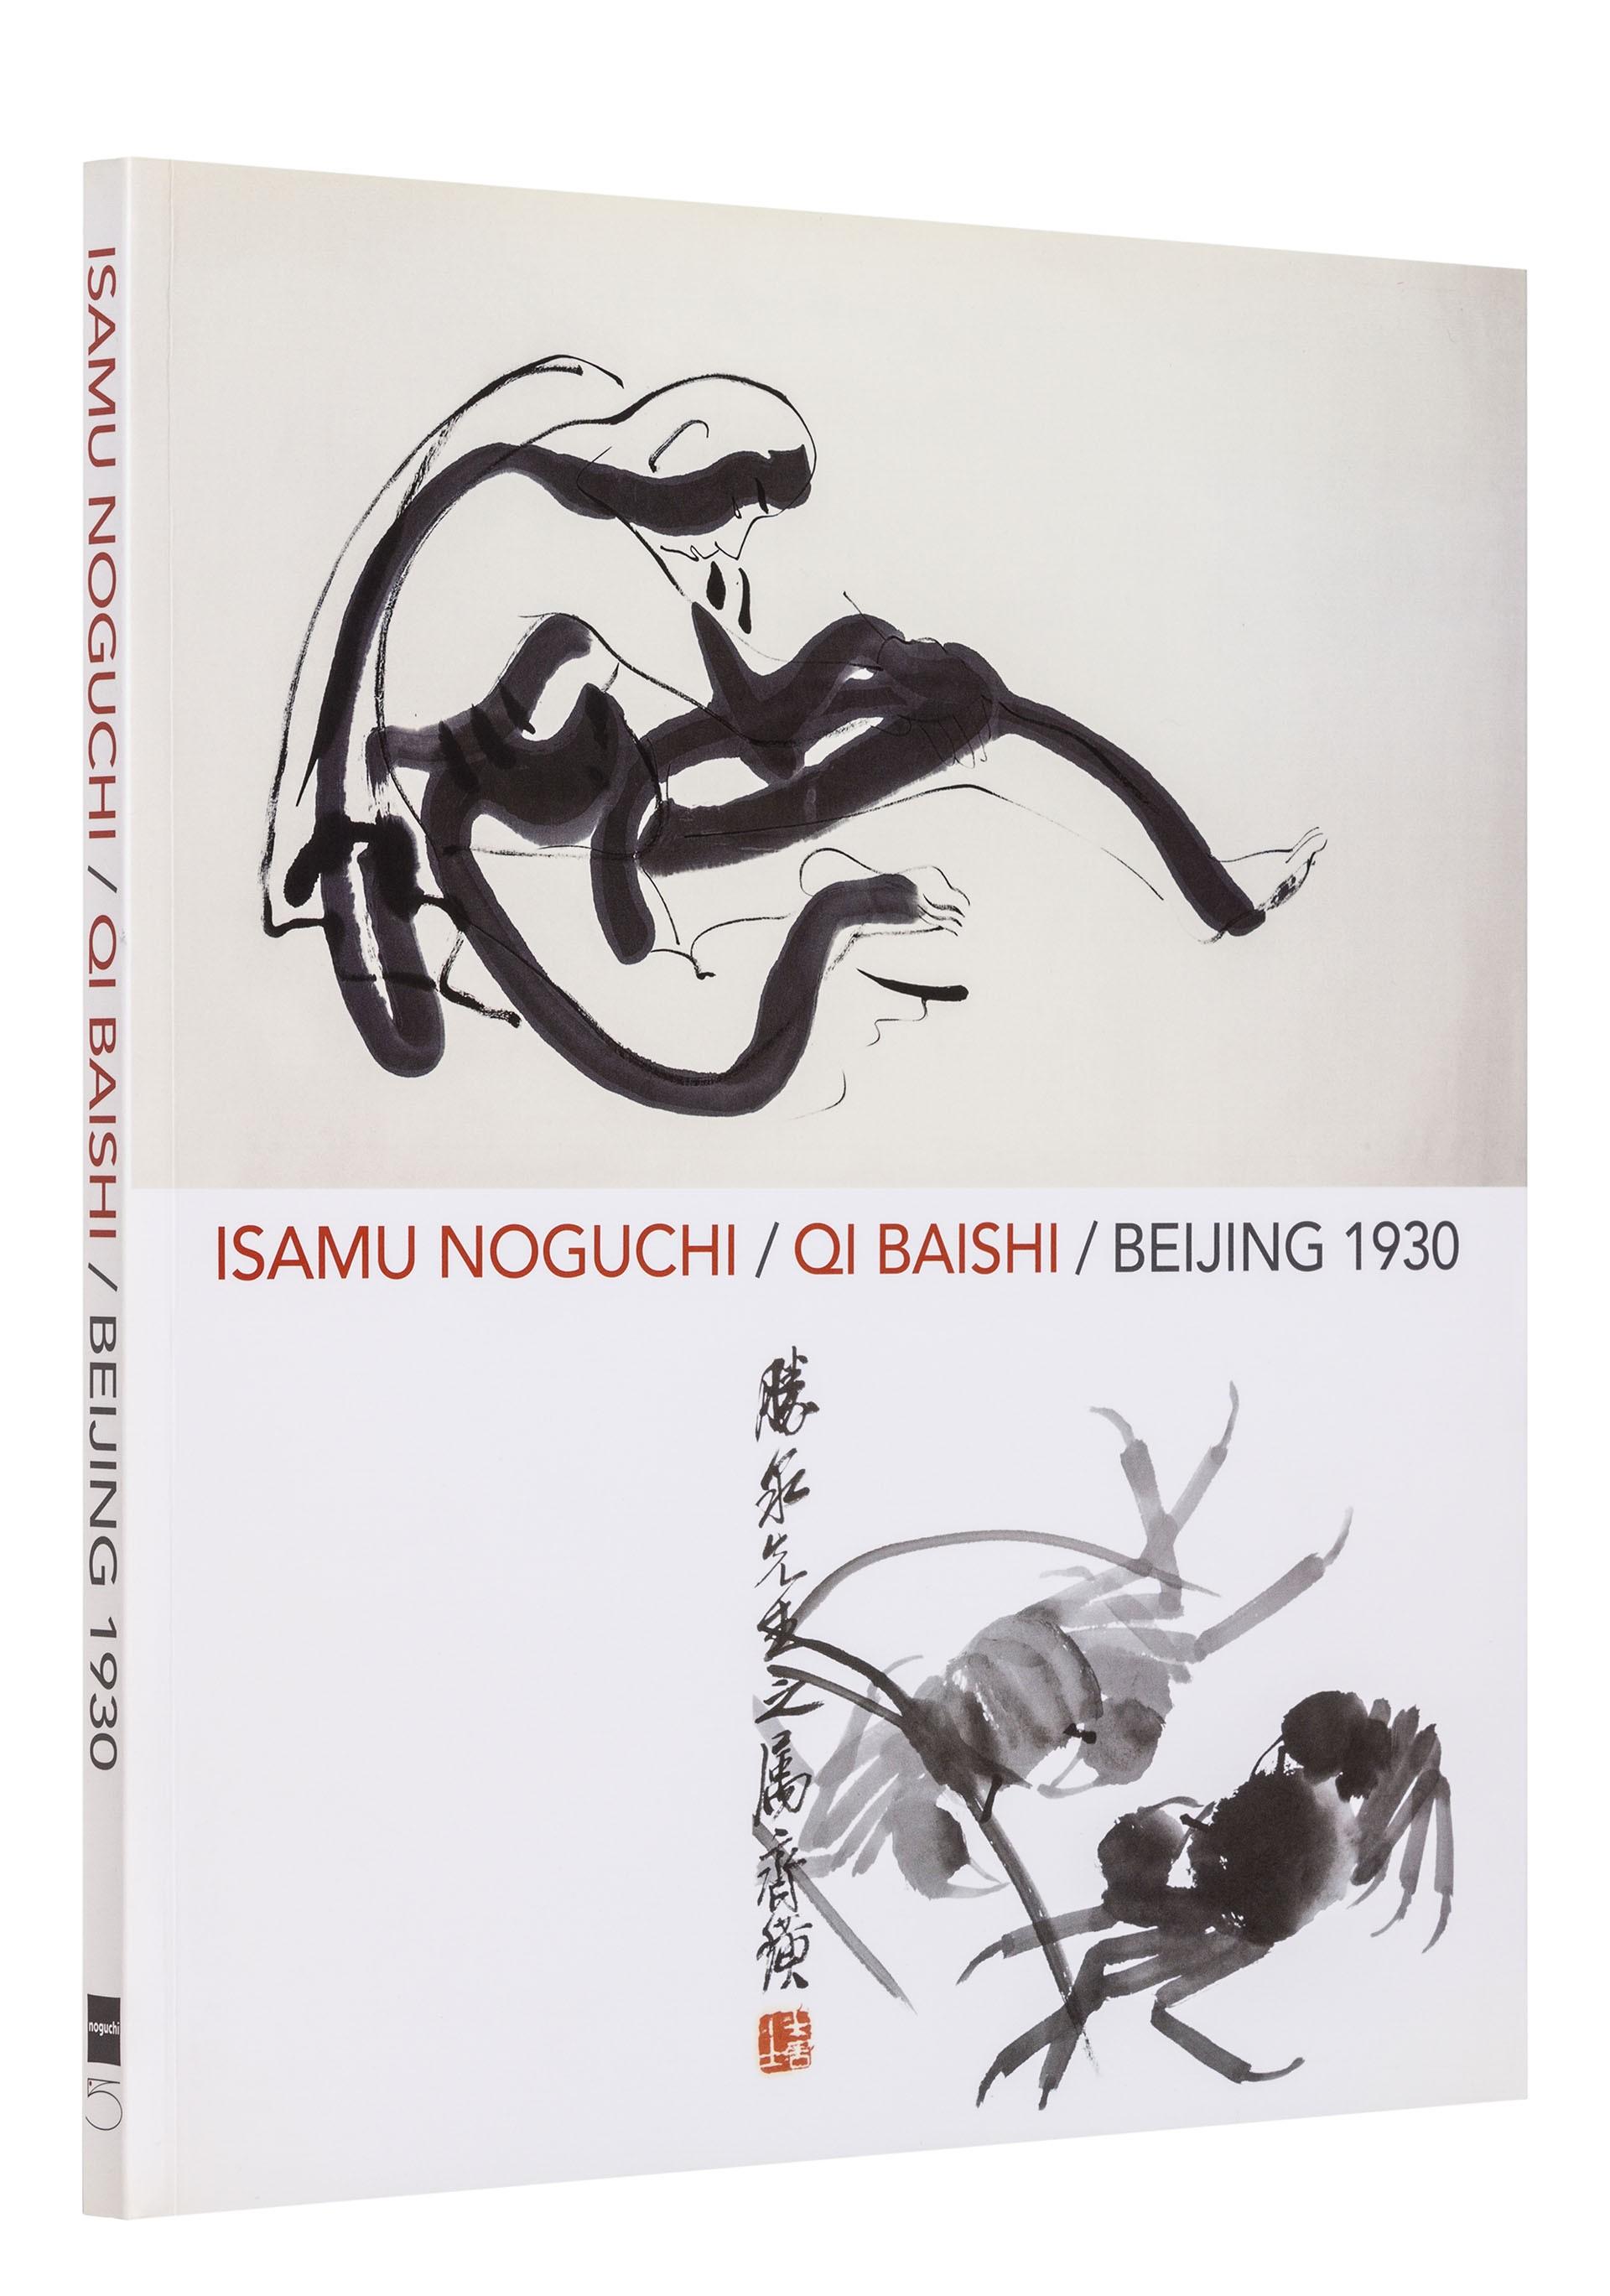 Isamu Noguchi | Qi Baishi | Beijing 1930